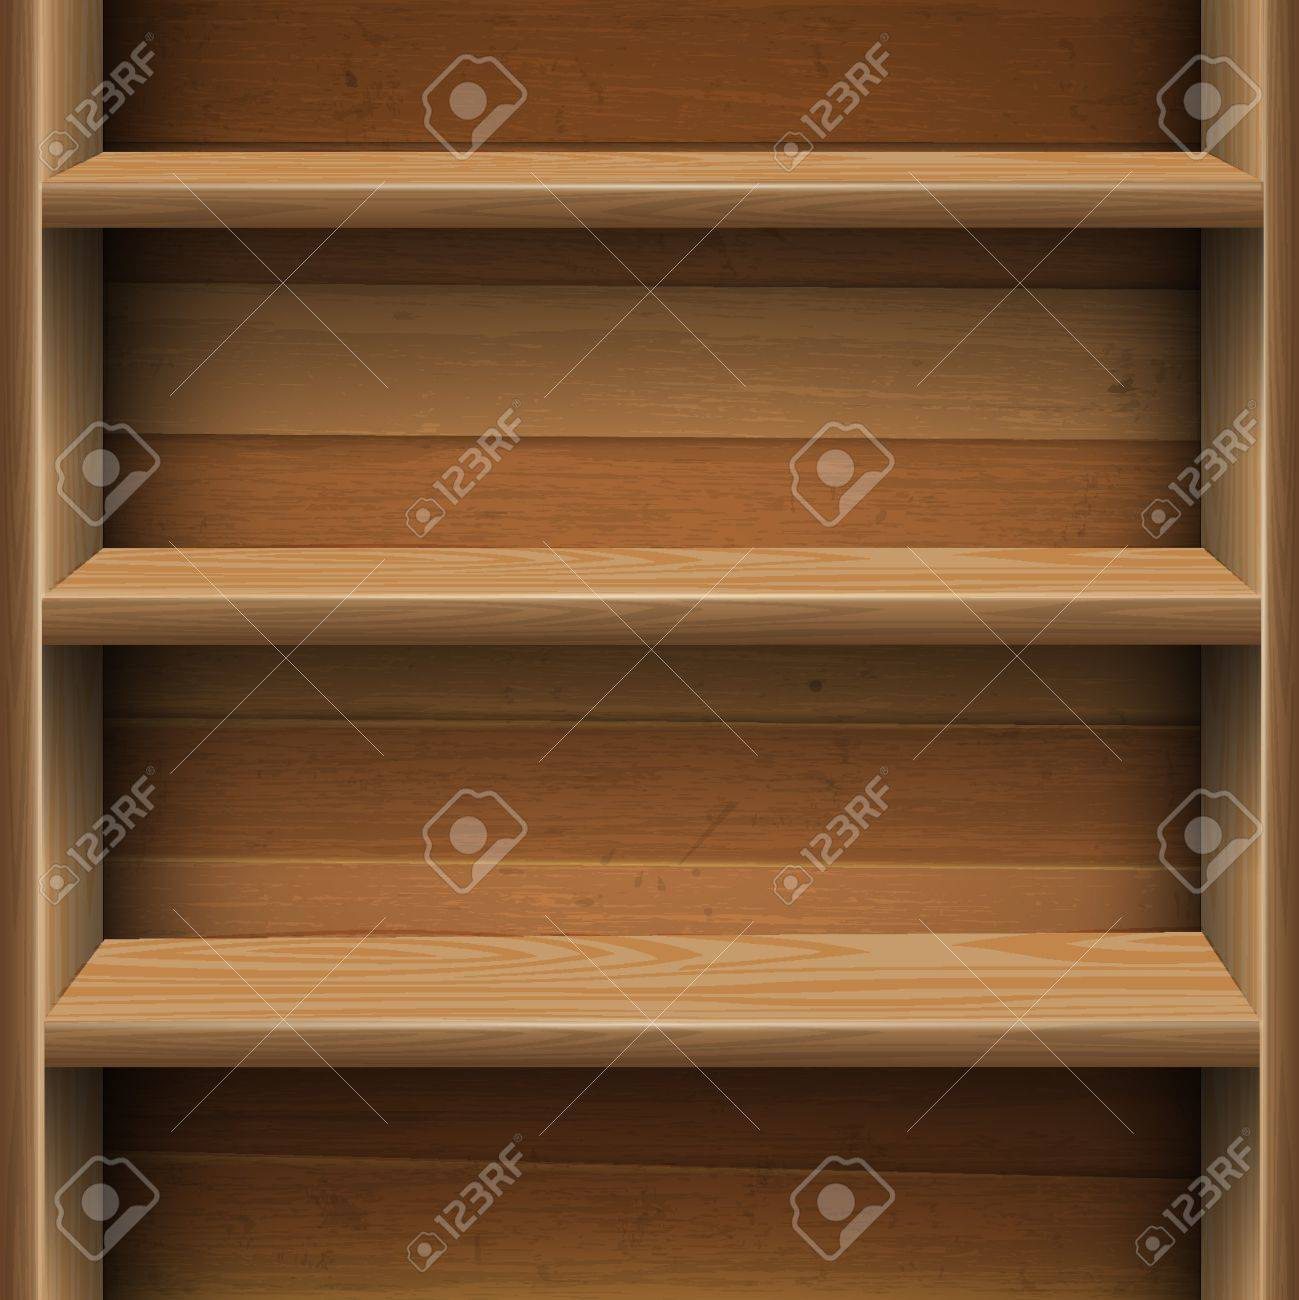 Interior wooden shelves free vector - Wooden Shelf Wooden Shelves Background